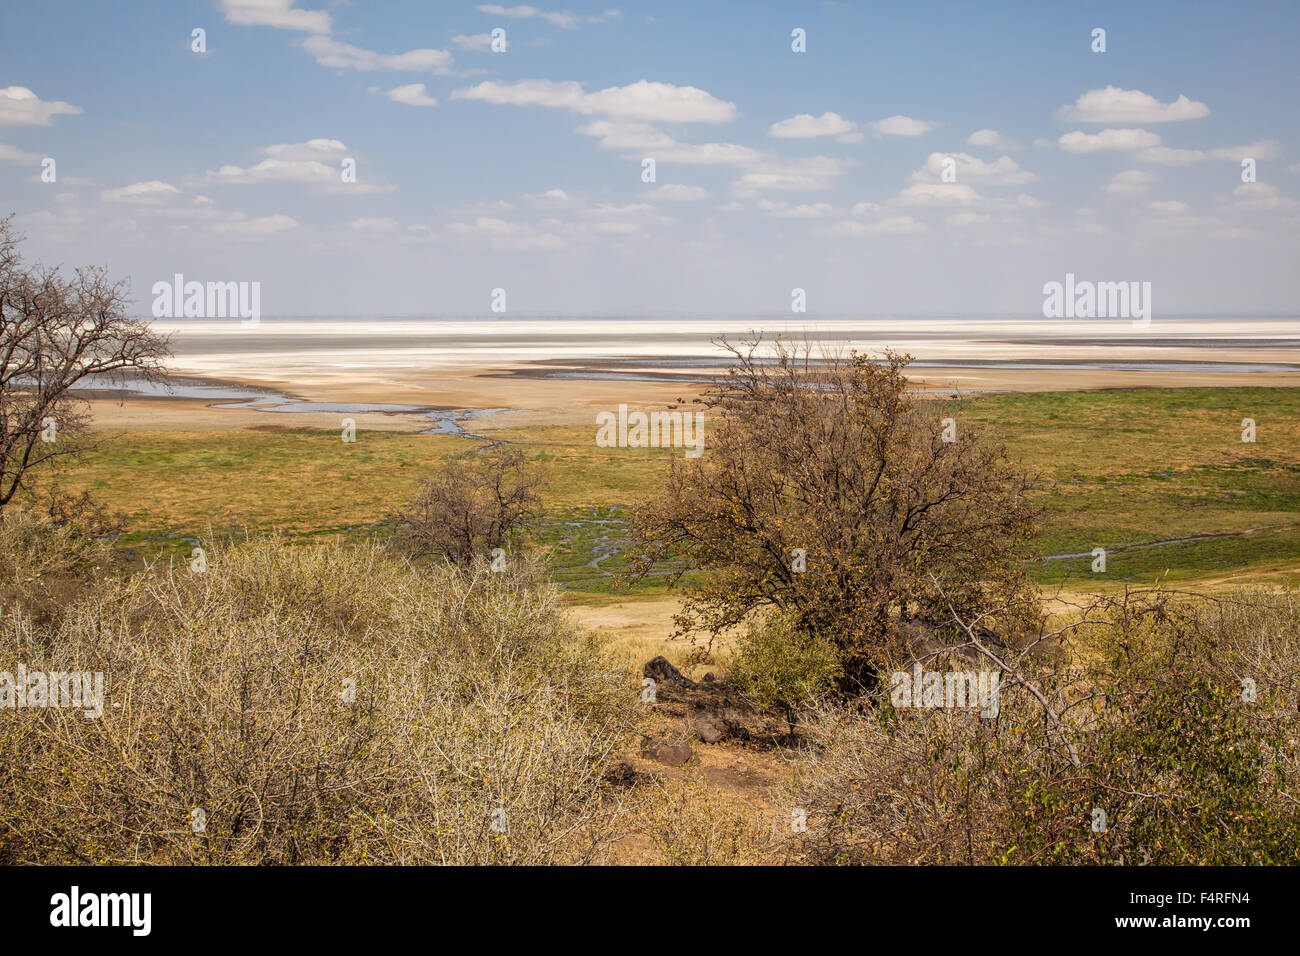 Africa, trees, Lake Manyara, national park, scenery, landscape, safari, travel, lake, Tanzania, water - Stock Image